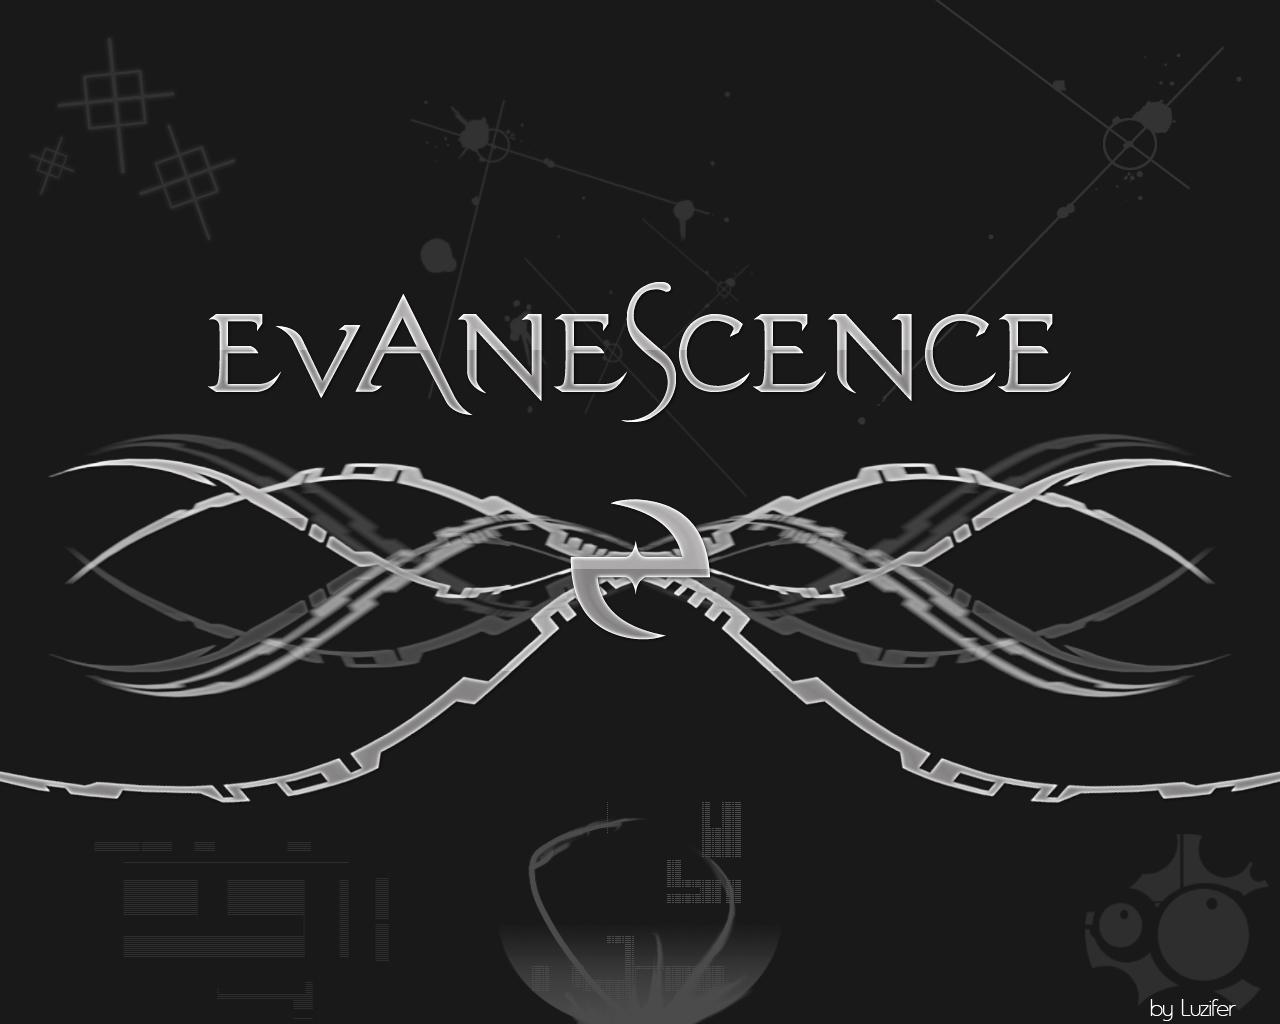 wallpaper evanescence 1280x1024